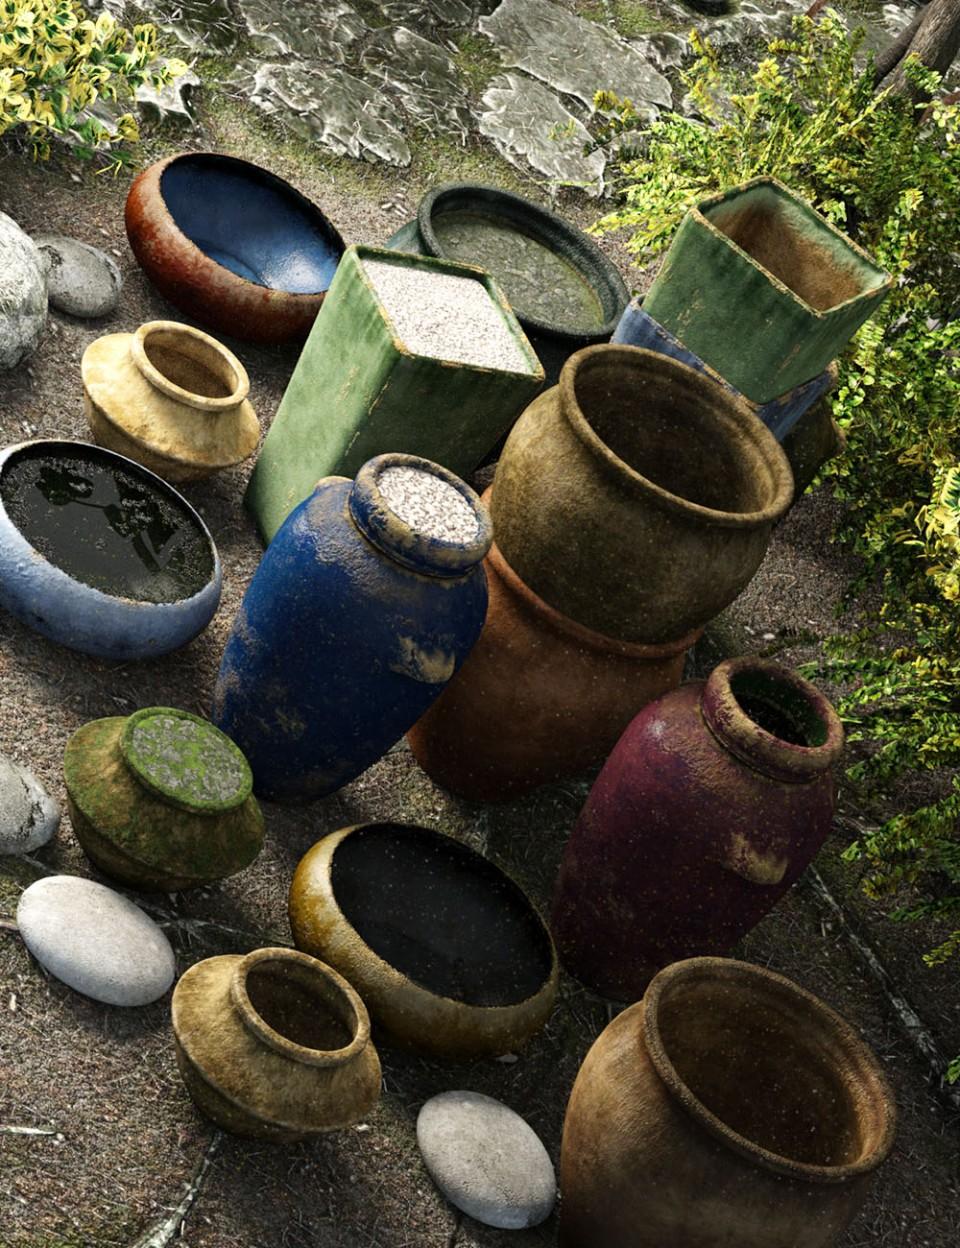 Garden Pottery_DAZ3D下载站